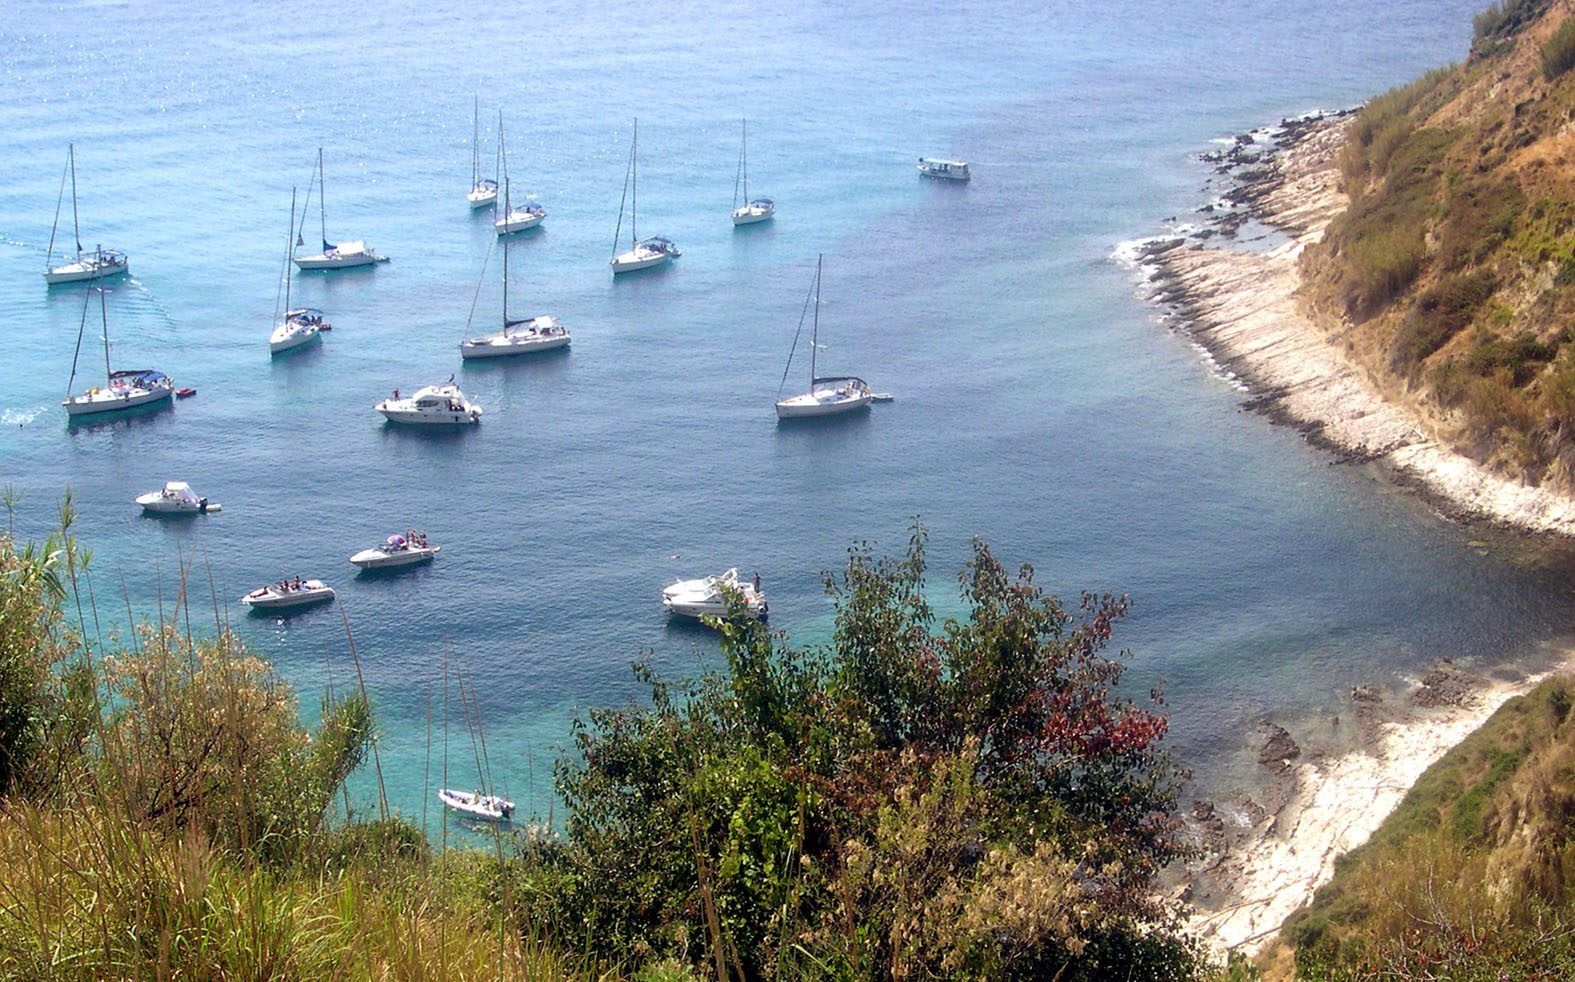 susak, 18082006 nauticari turisti zaljev stara luka guzva foto: srdan vrancic -pok-